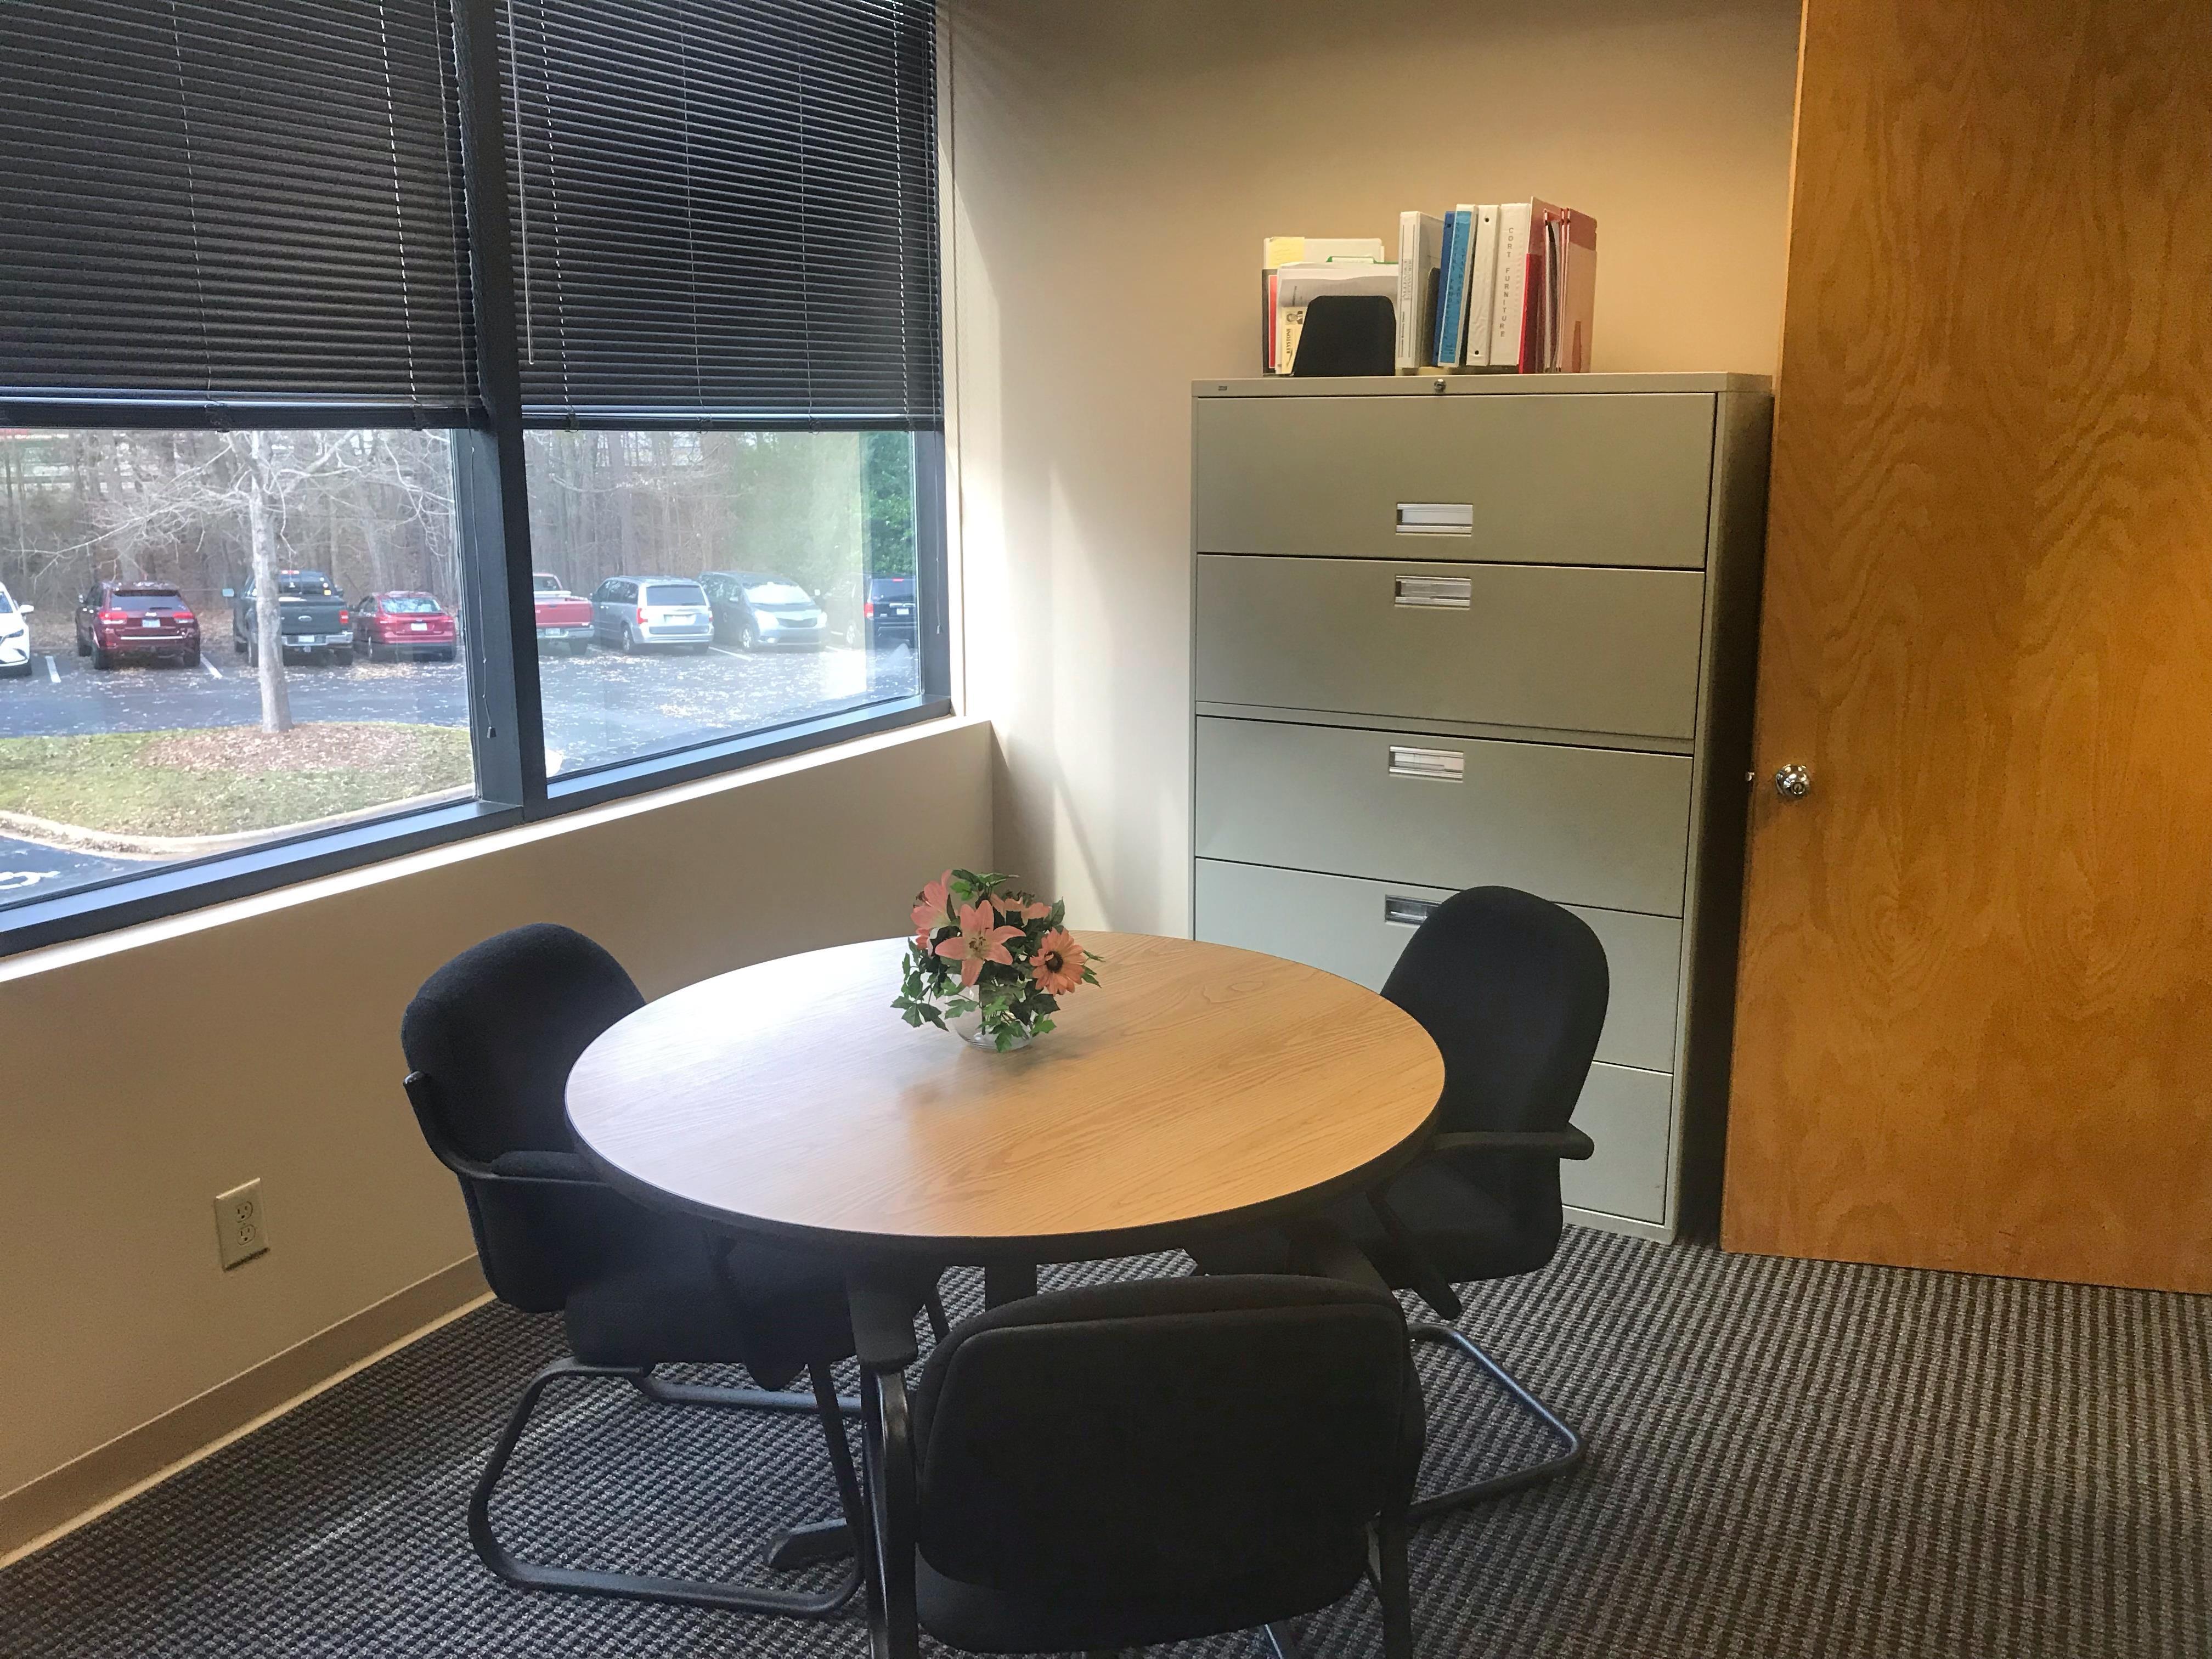 TKO Suites - Raleigh, NC - Windowed Office Suite For 4